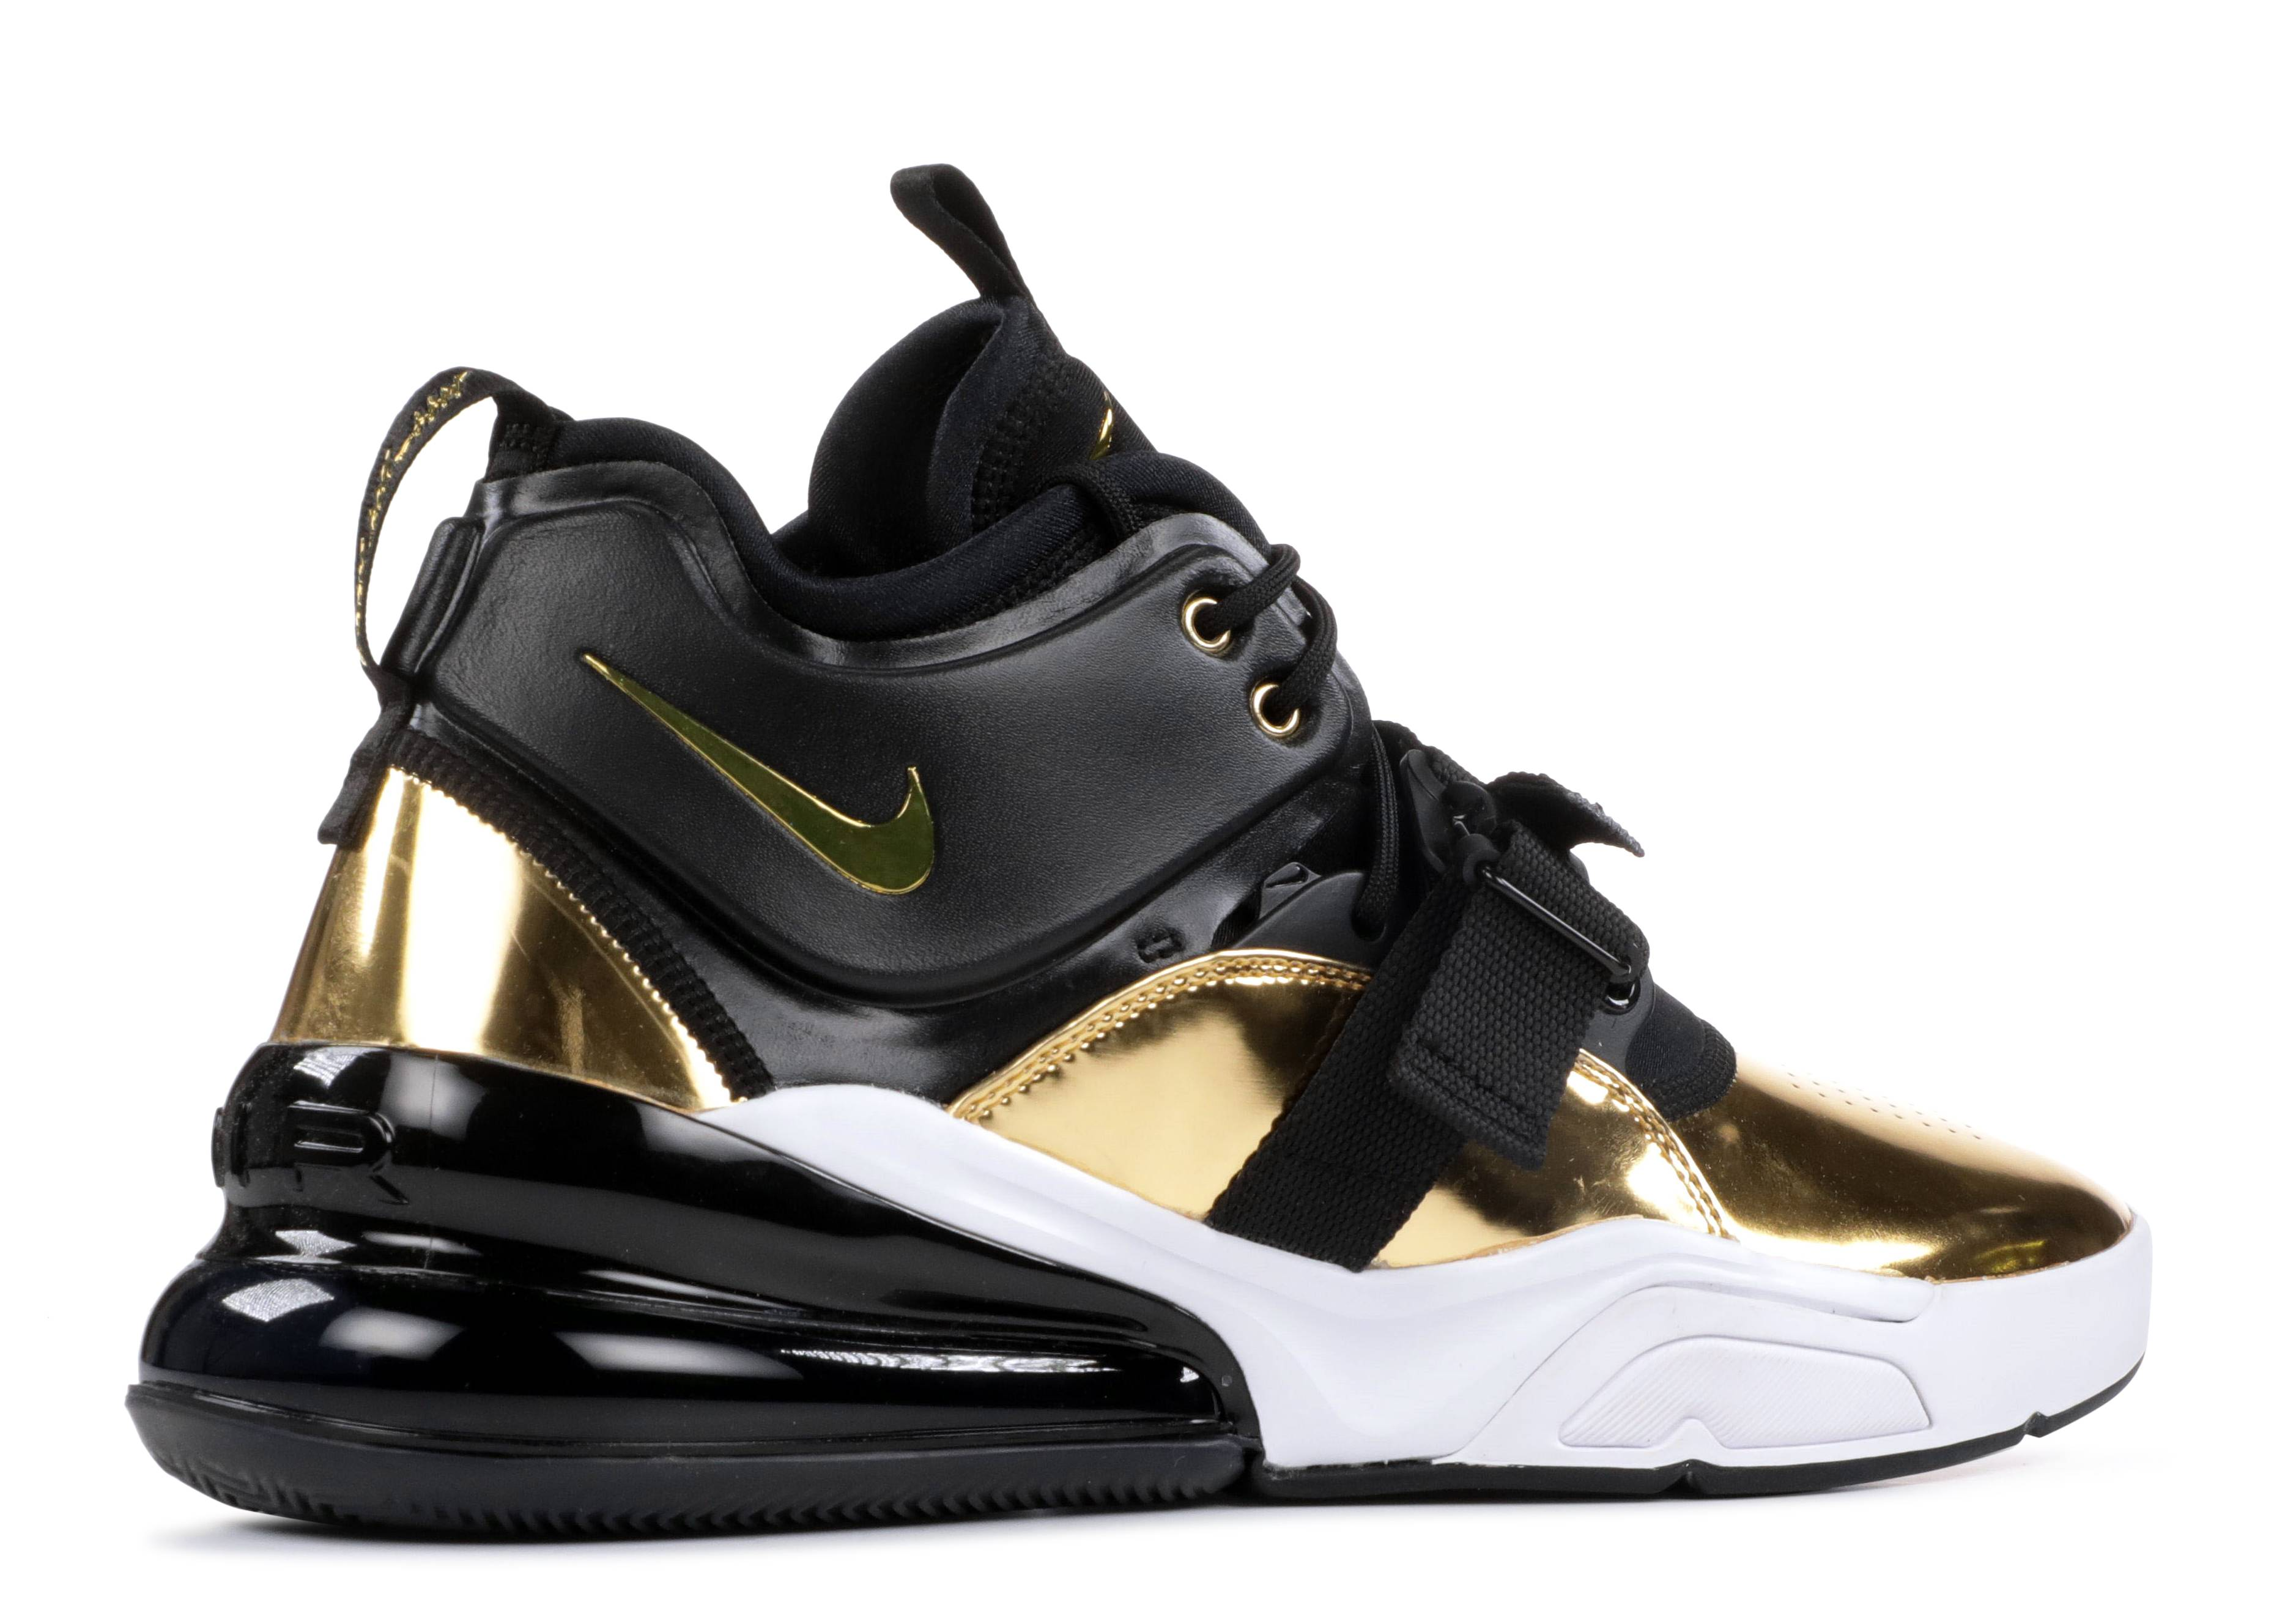 Air Force 270 Ct16 Qs Nike at5752 700 metallic gold